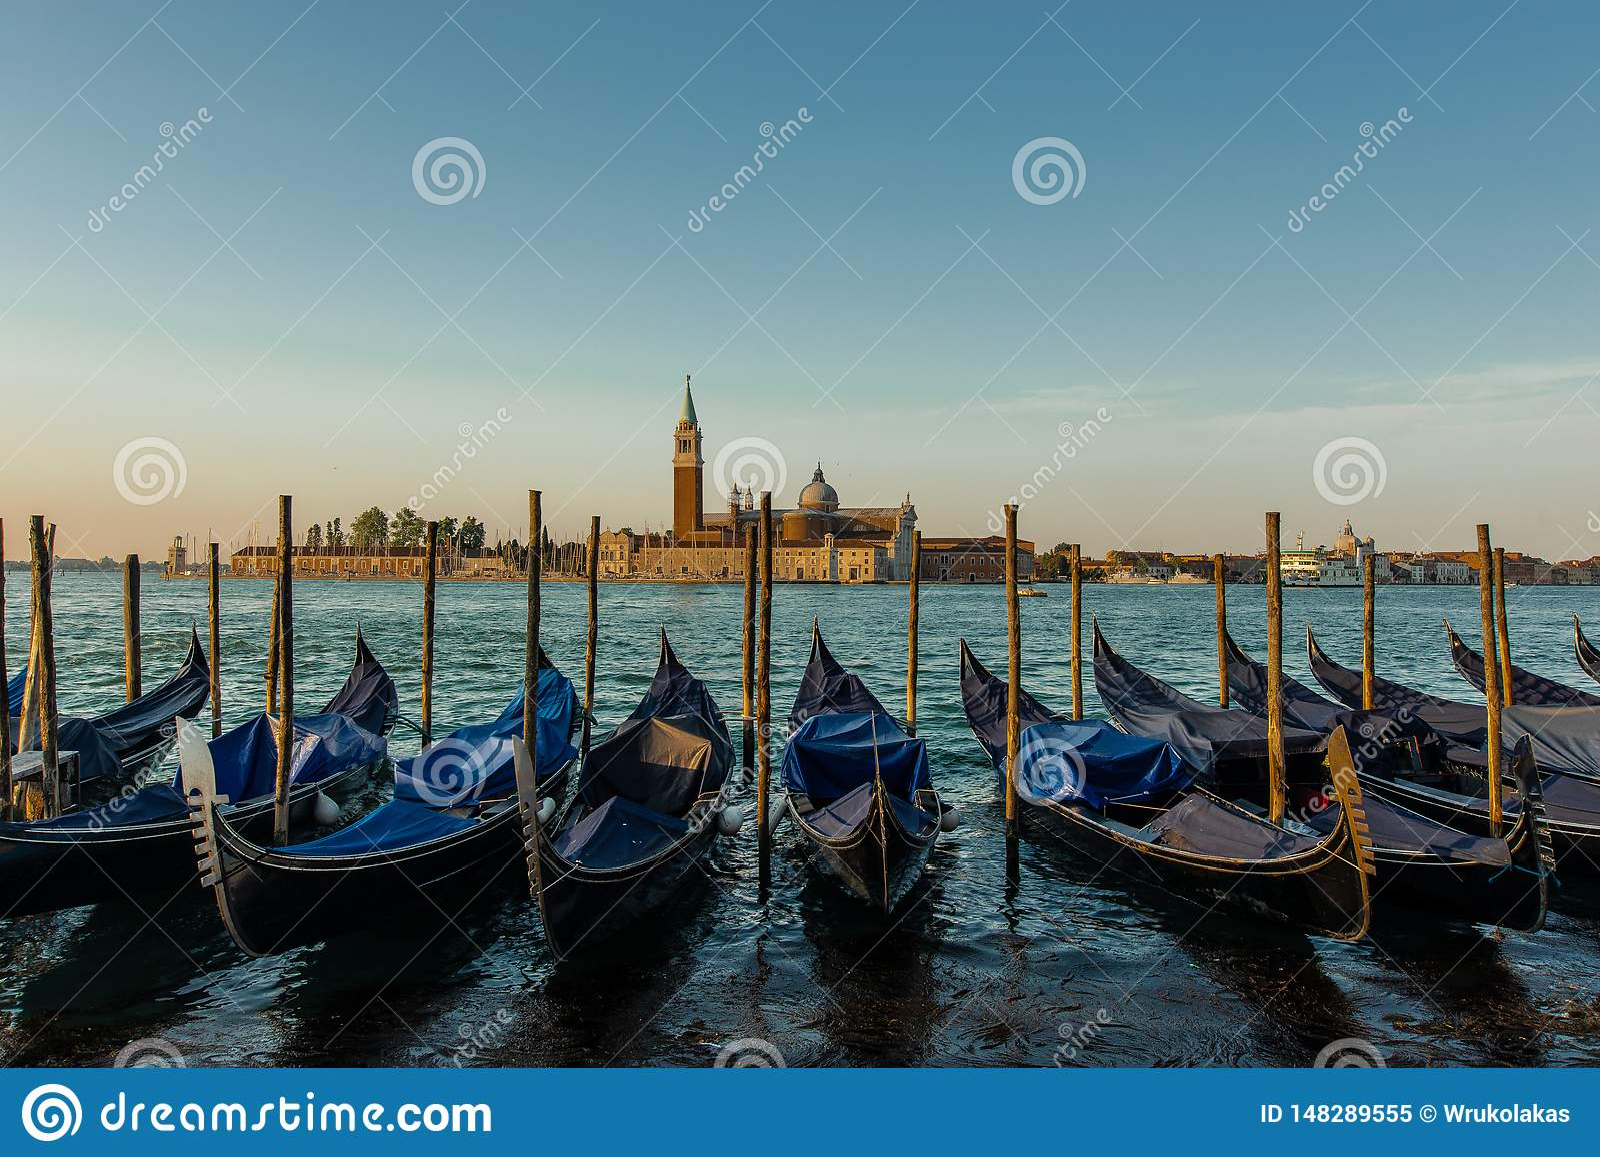 Traditional Gondolas at Venice